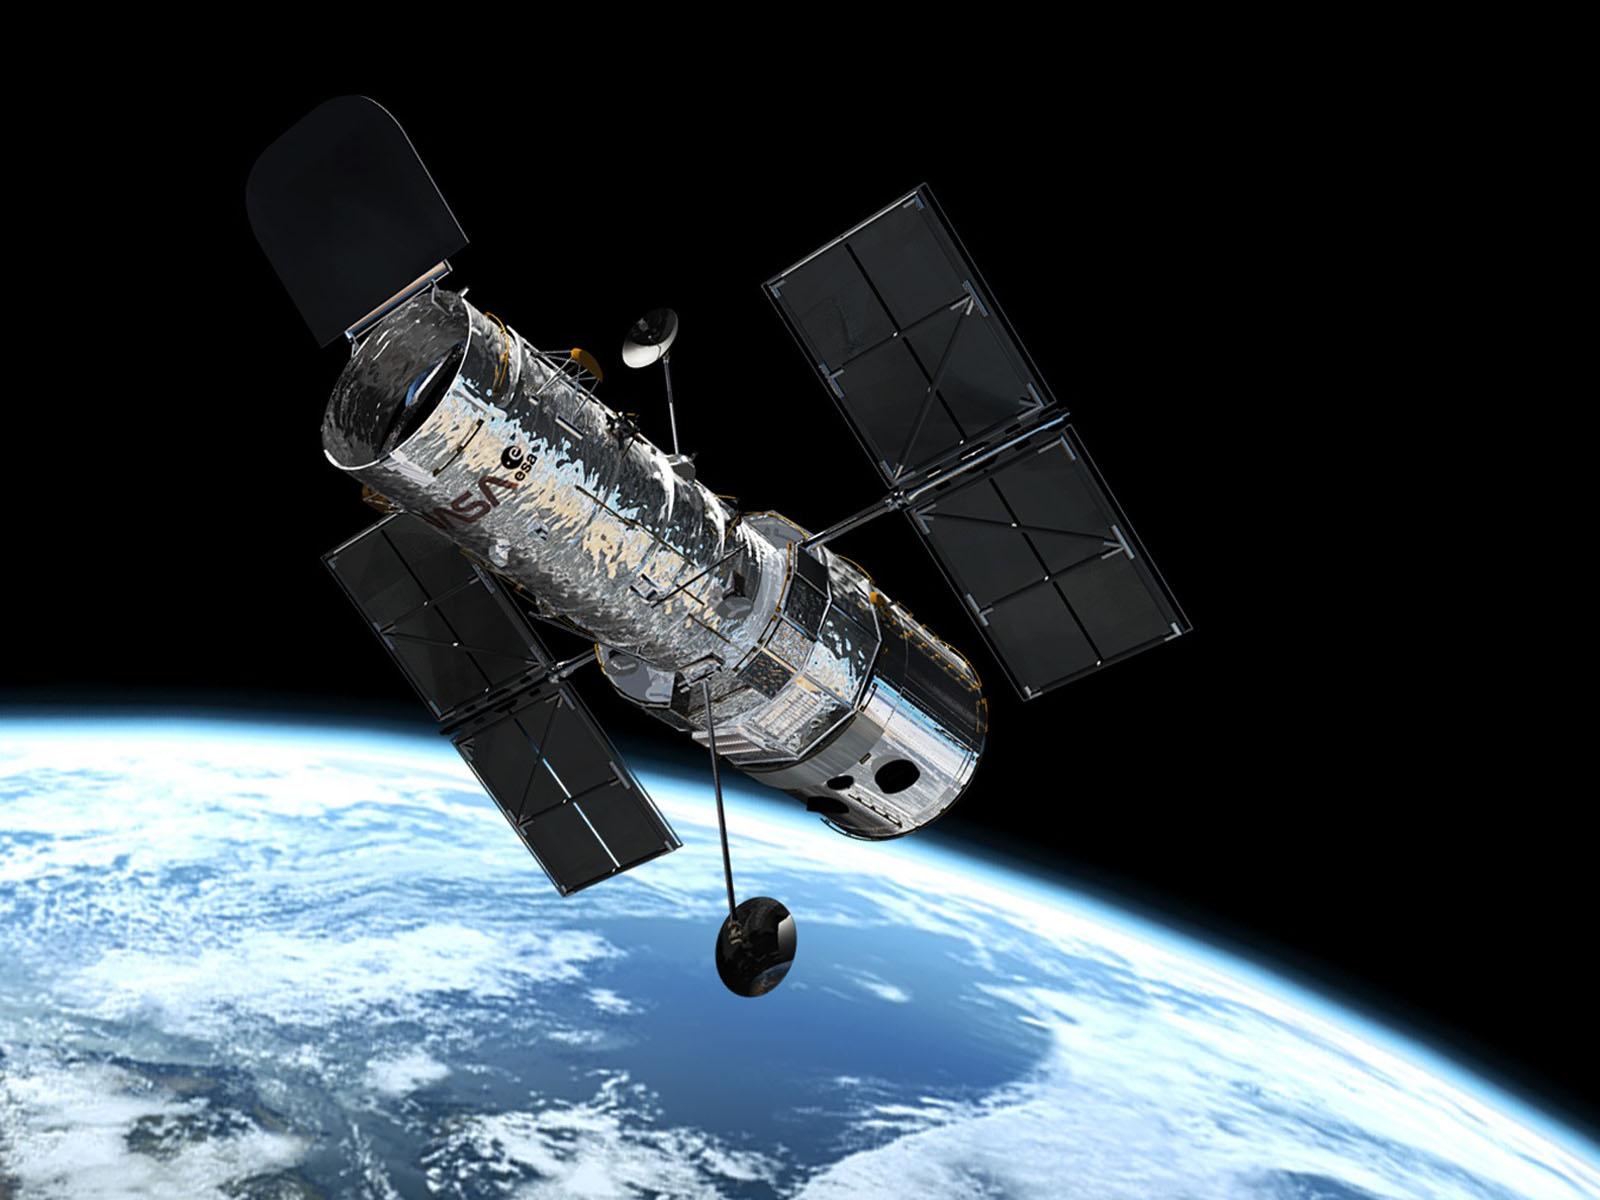 satellite and spacecraft - photo #3